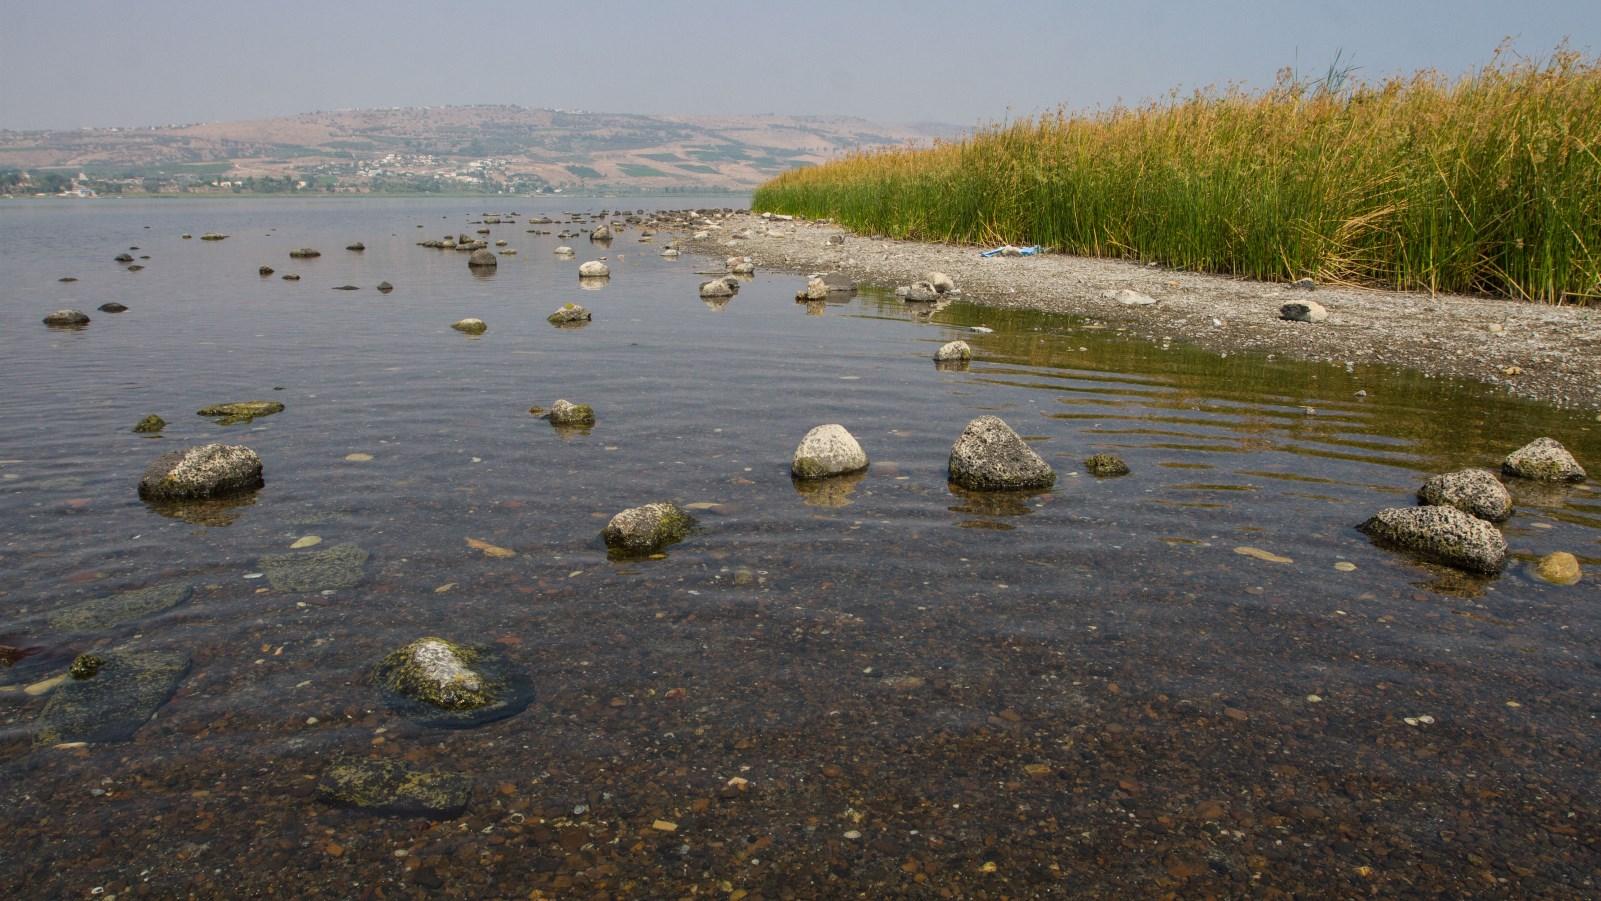 How Israel swims against tide of worldwide water crisis | ISRAEL21c